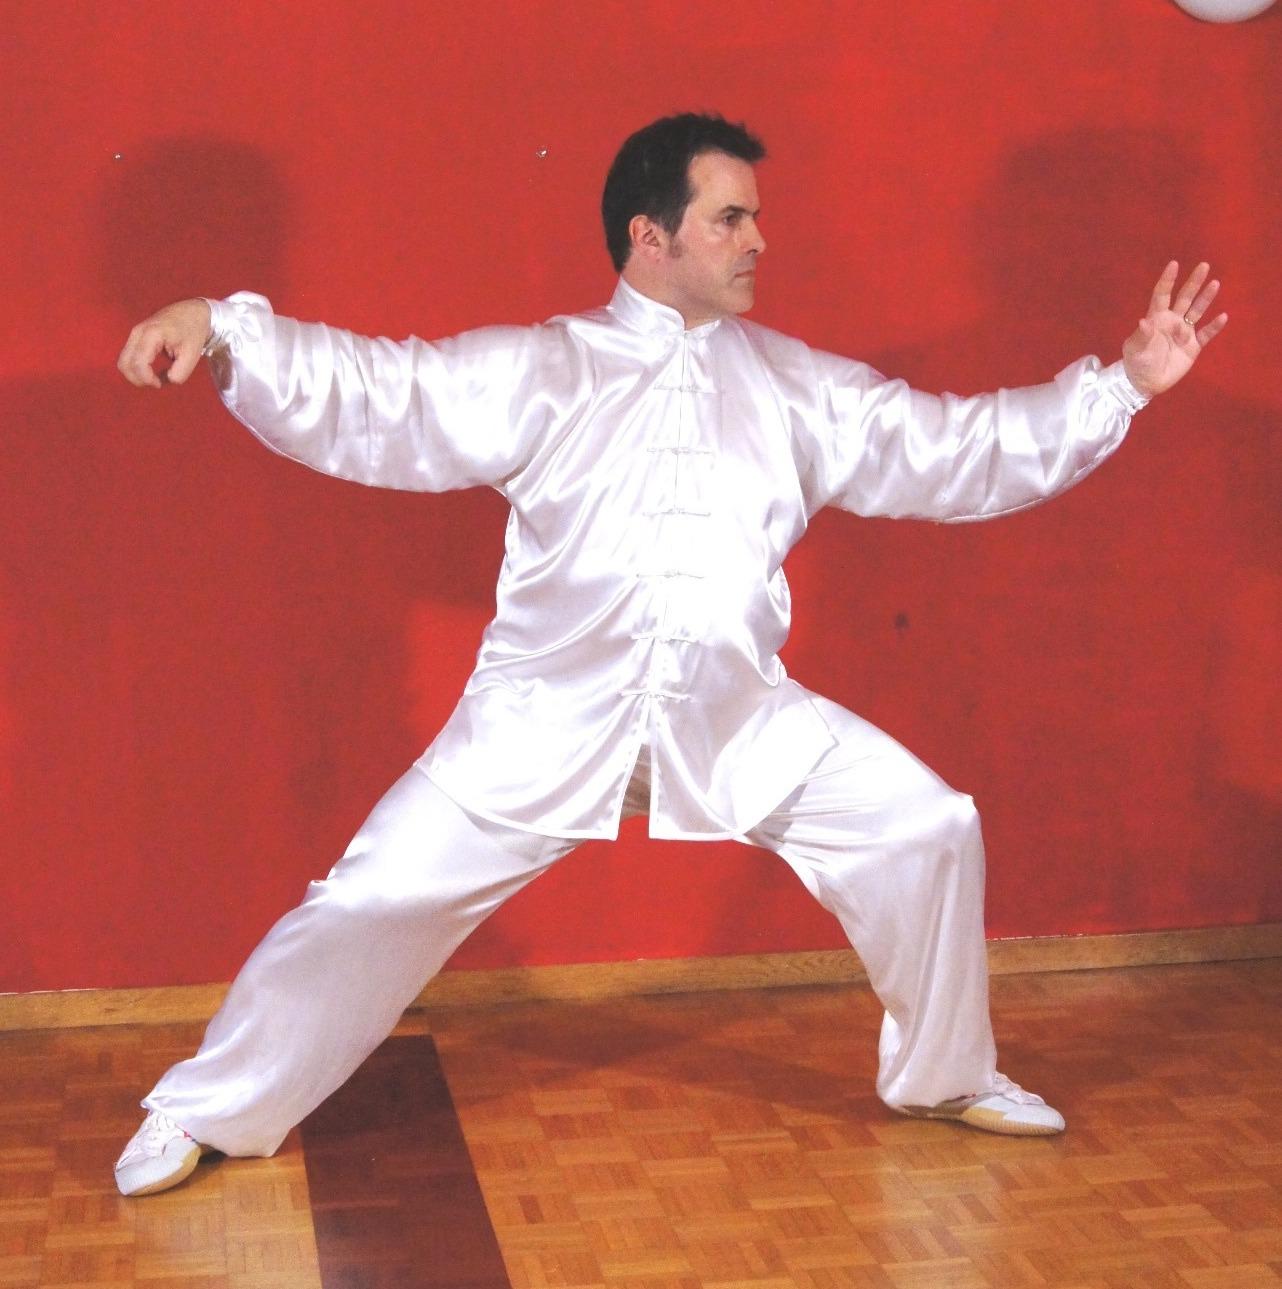 Dan Bian Bewegung aus dem Chen Stil Taichi